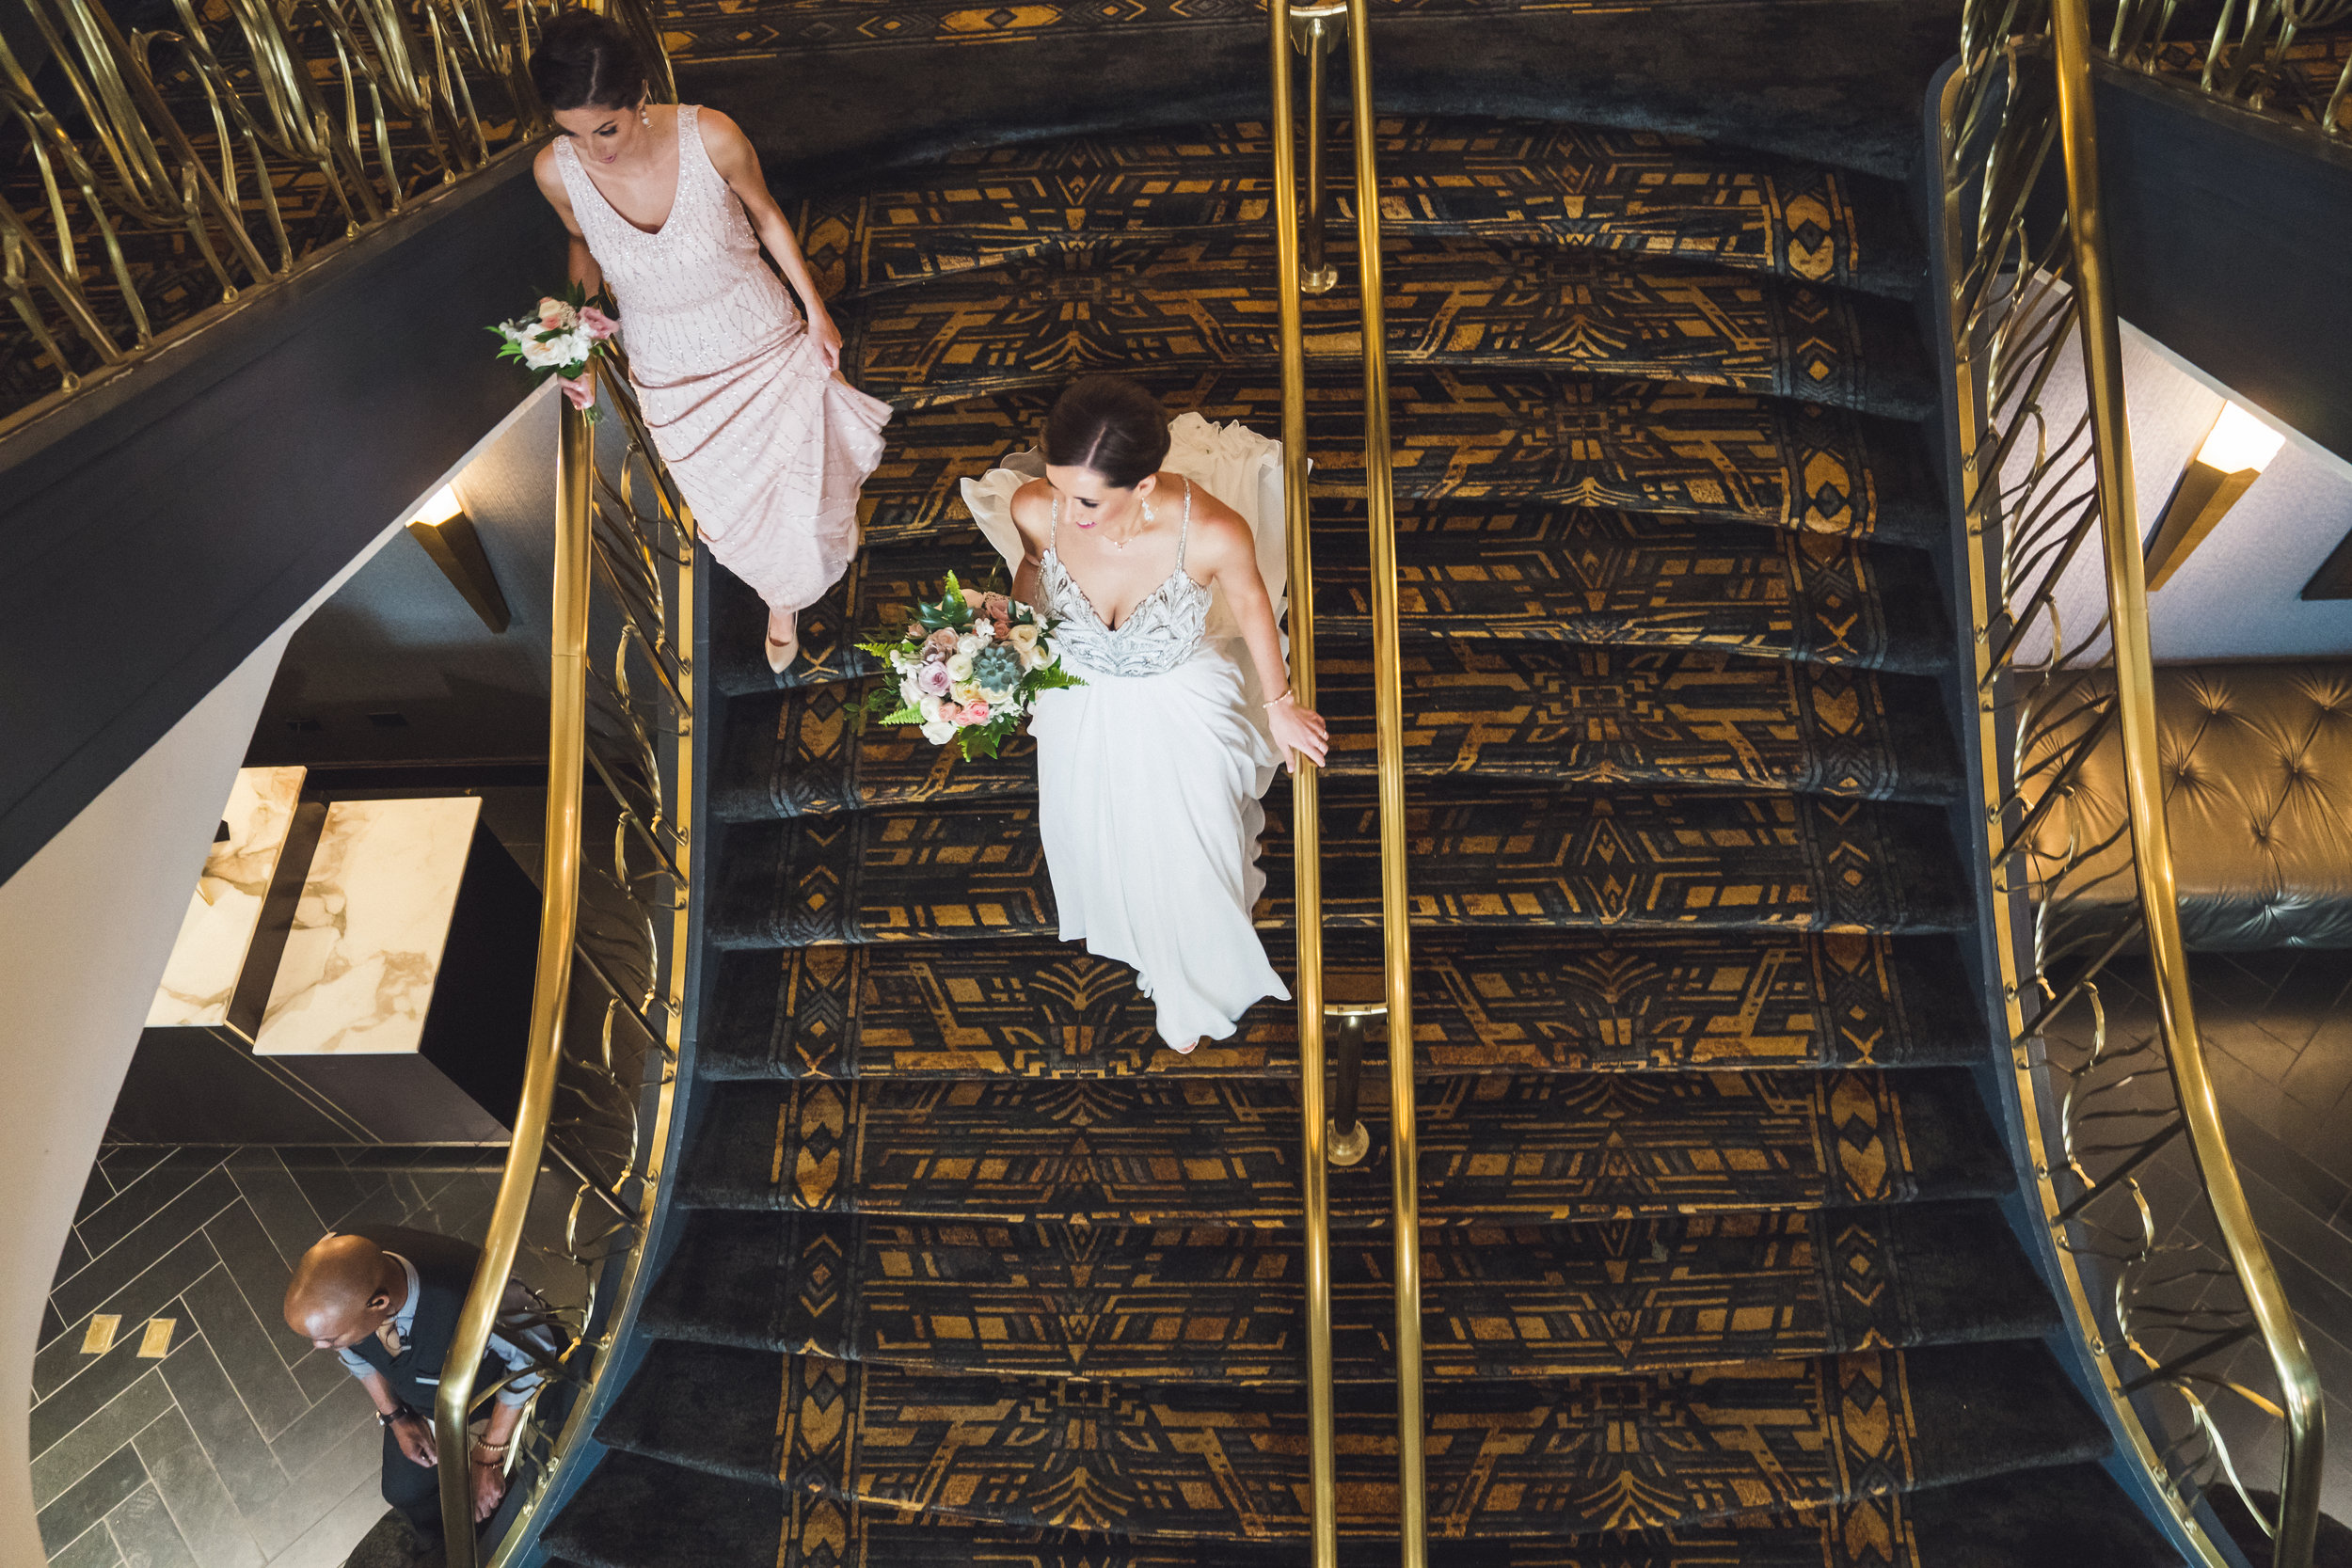 kimpton-chicago-wedding-staircase-wedding-planner